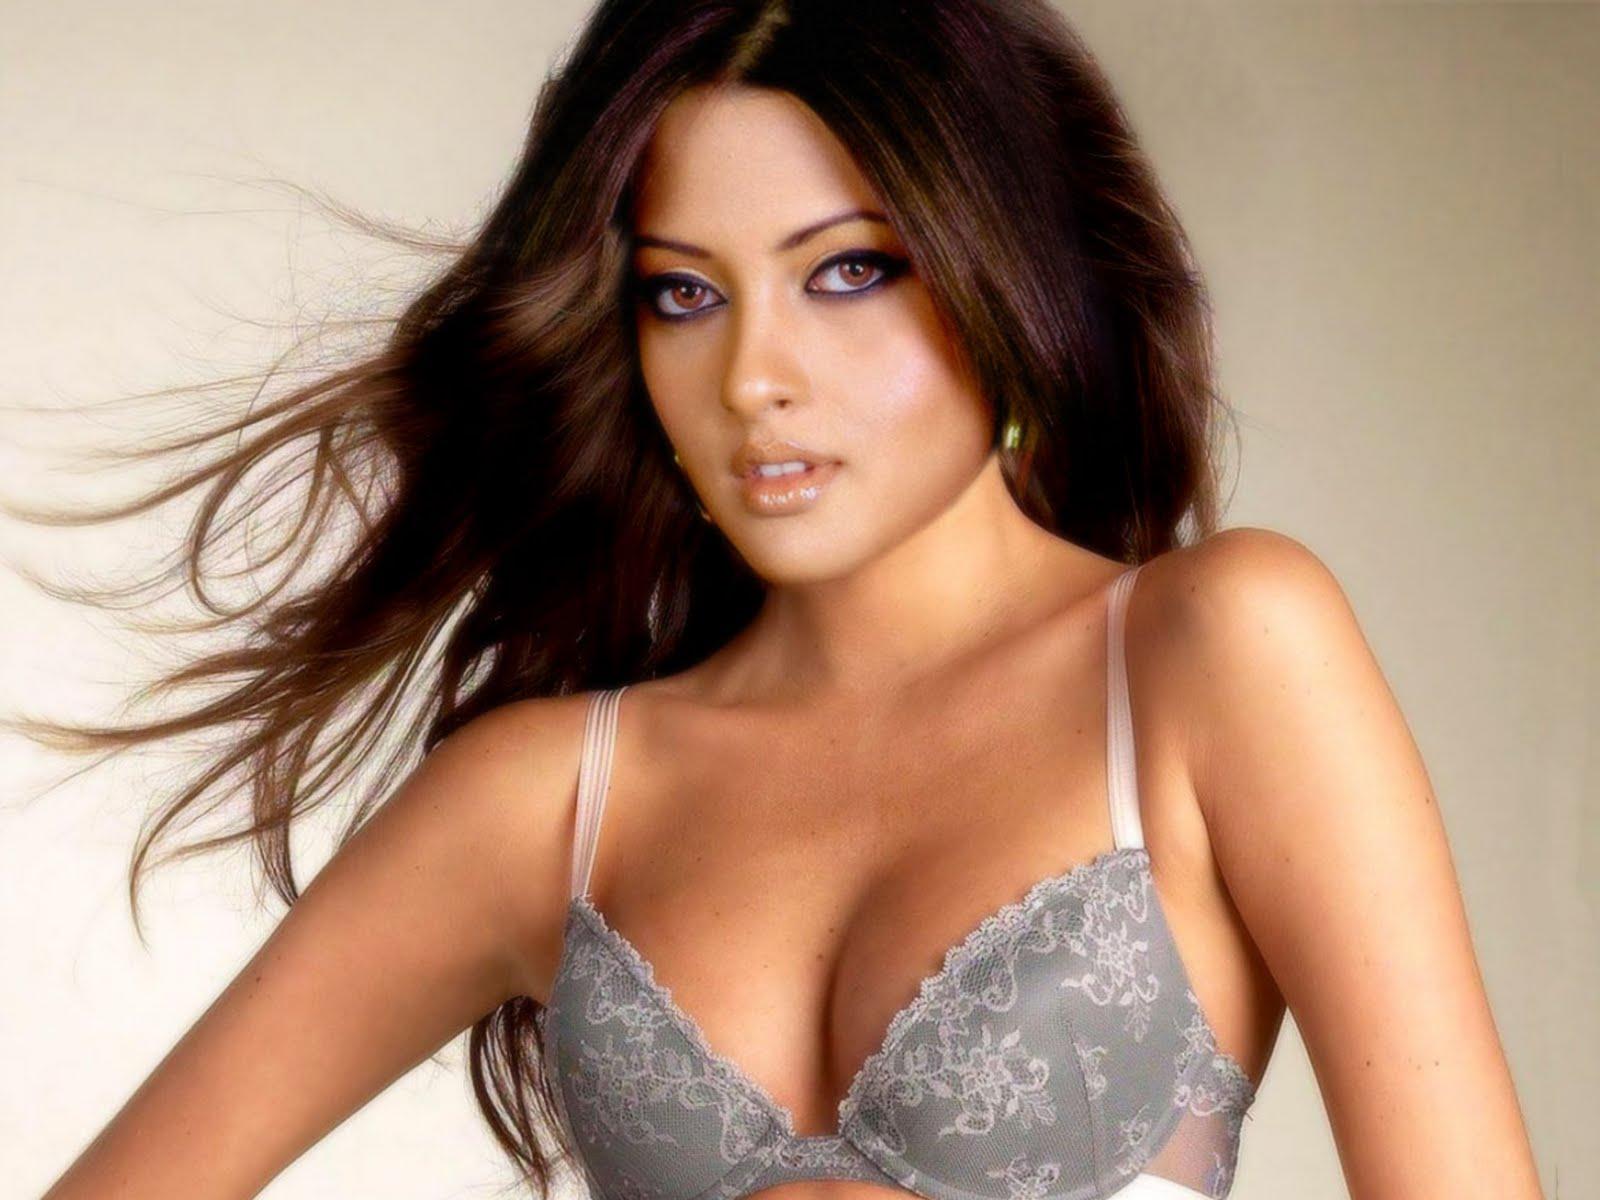 Celebrity News: Riya Sen,Riya Sen HD wallpapers,Unseen